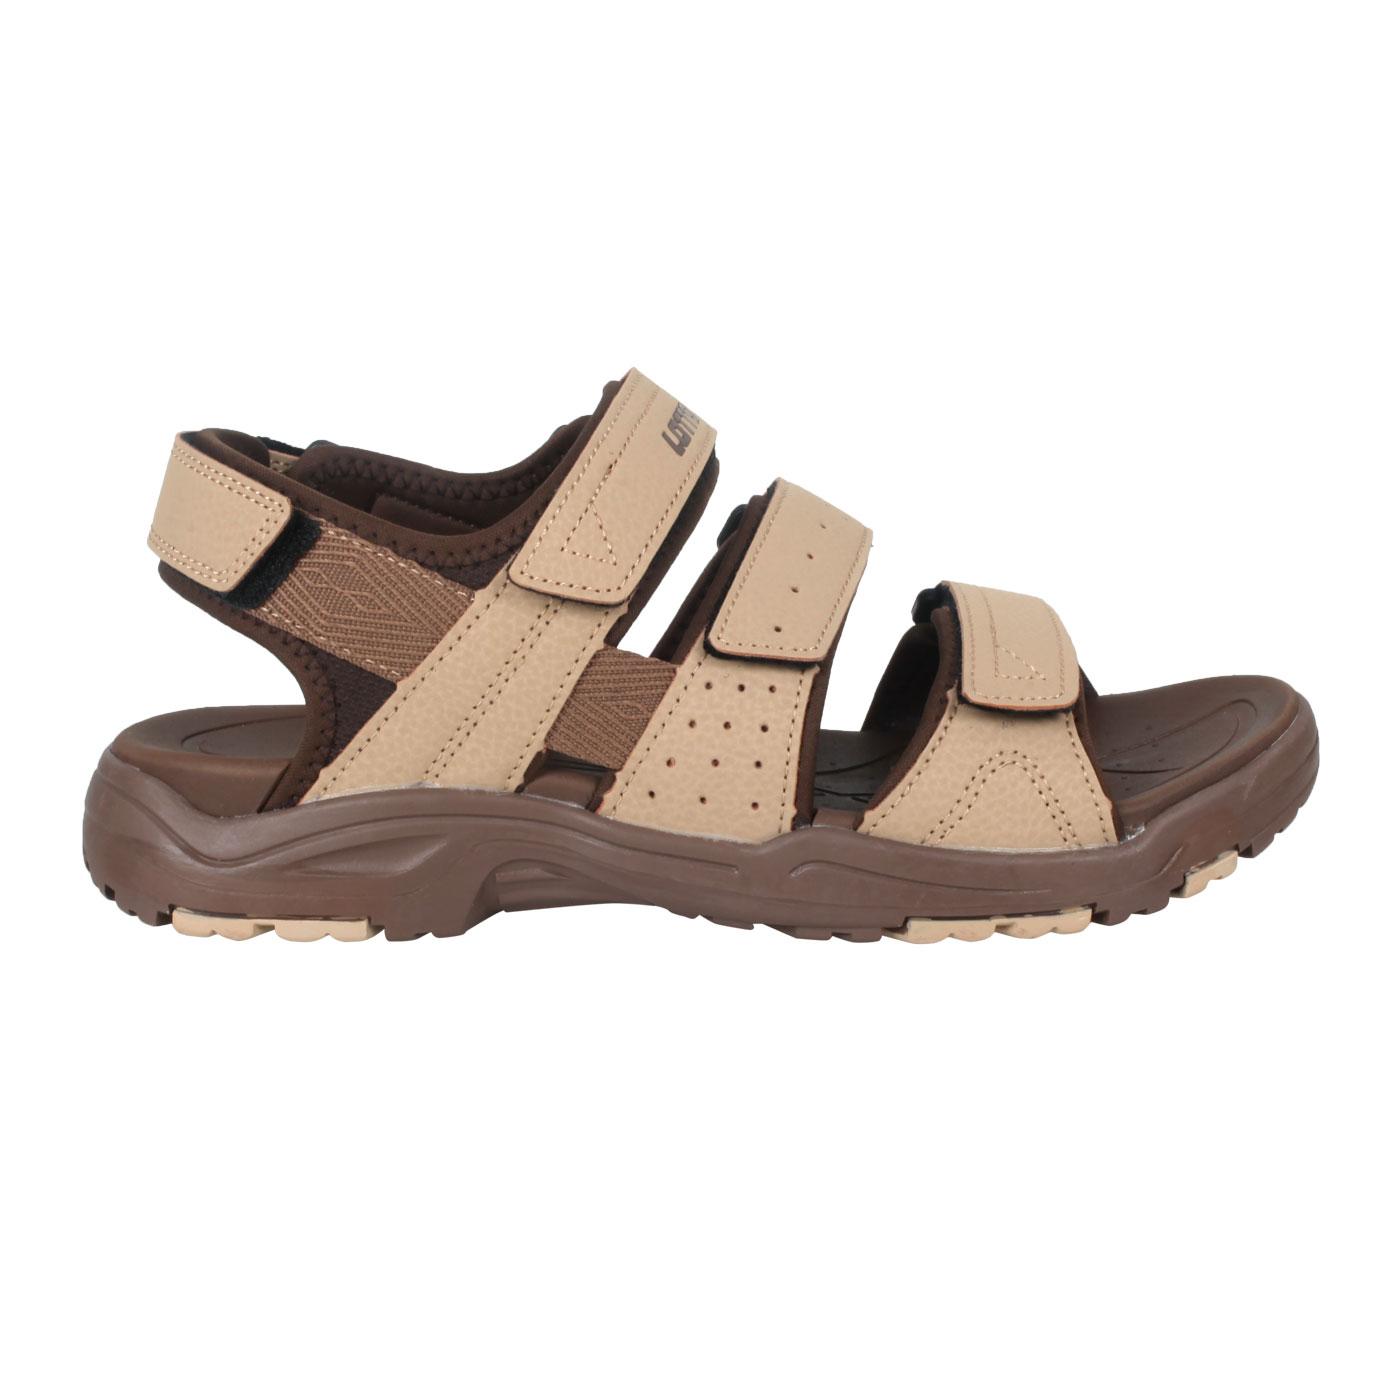 LOTTO 男款運動涼鞋 LT1AMS3351 - 淺棕深咖啡